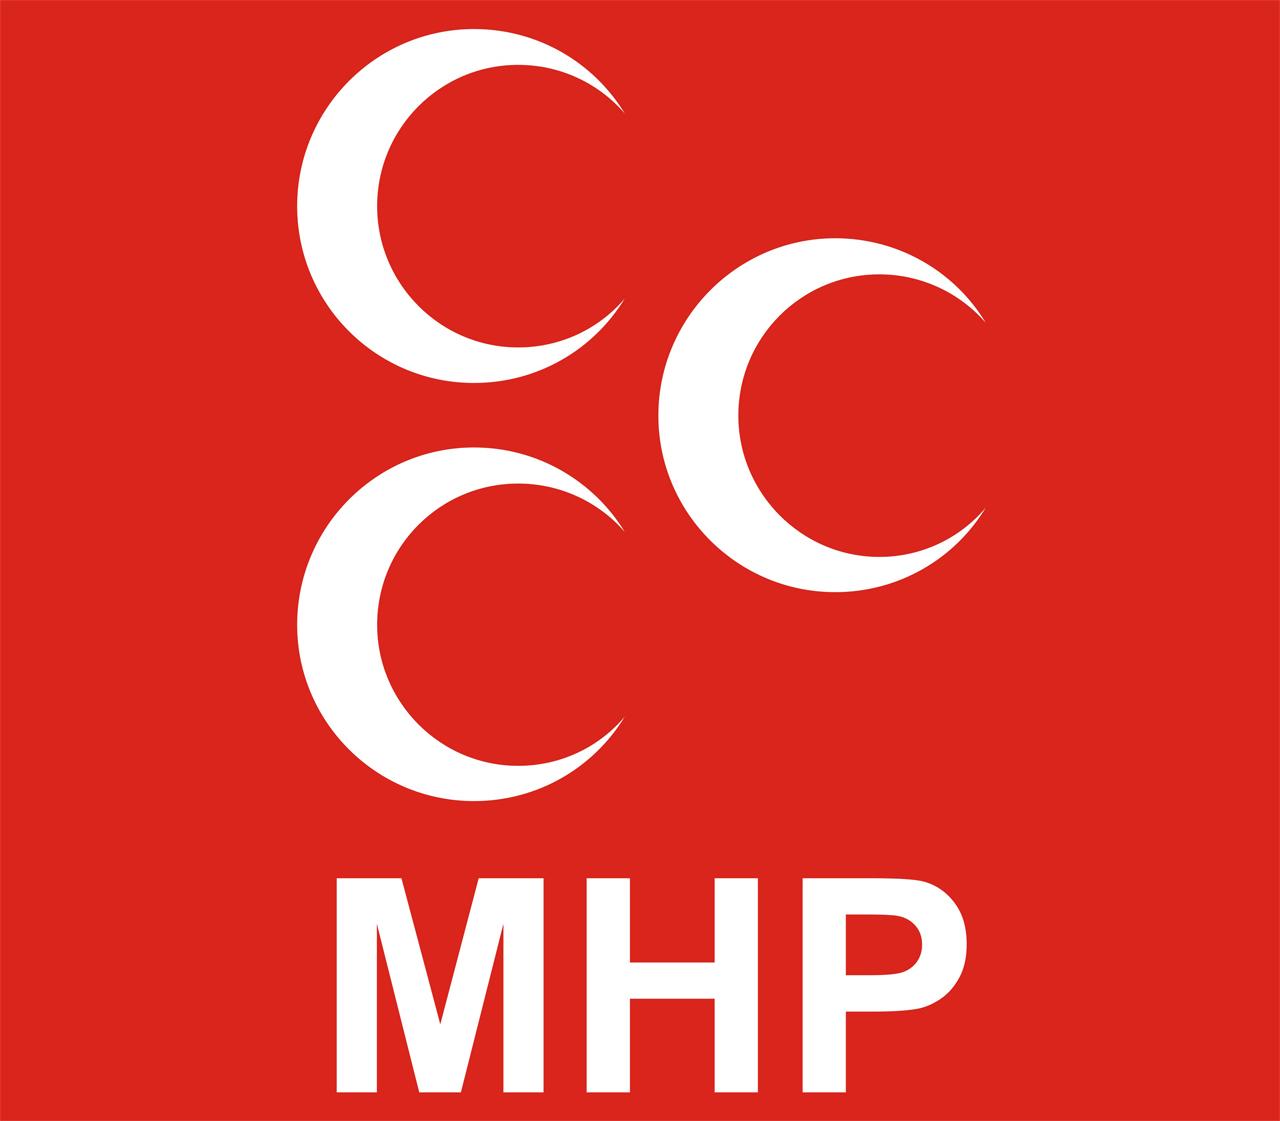 MHP Milliyetçi Hareket Partisi Logo photo - 1